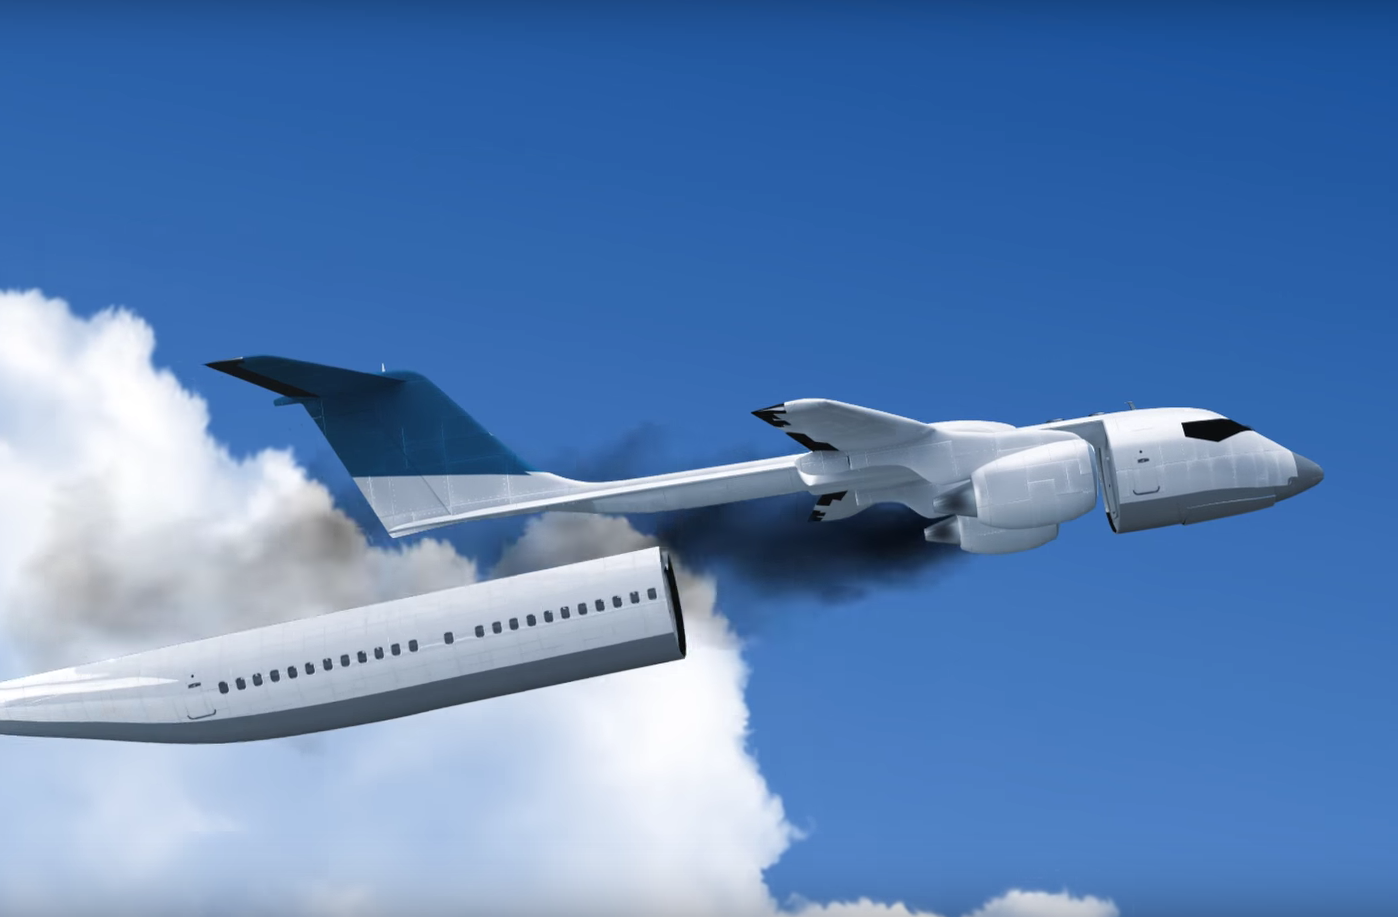 cabina avion desmontable segura 6